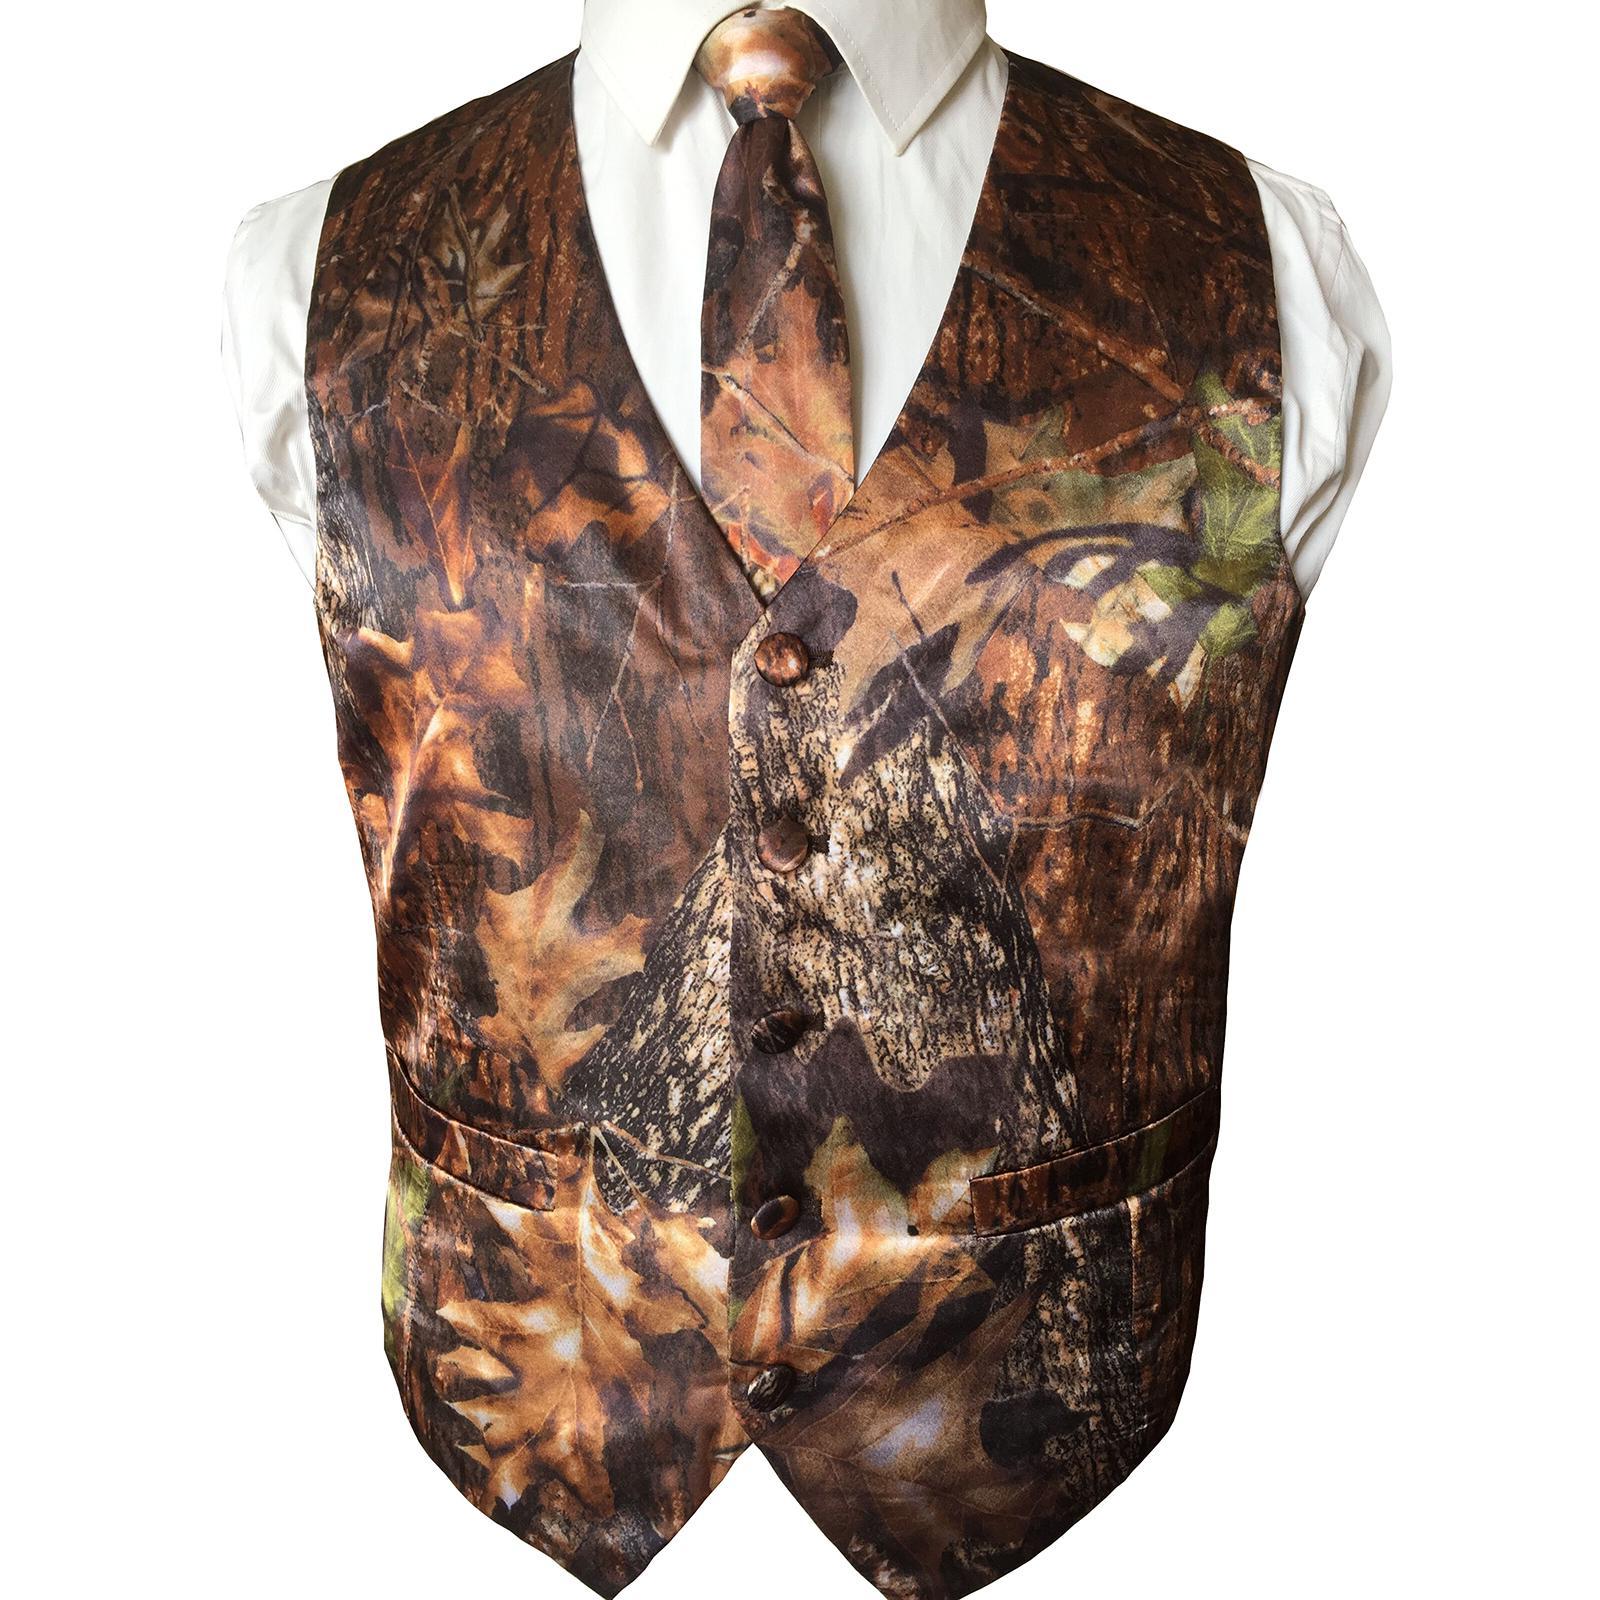 Casual Camo Gilets pour hommes Tuxedos Groom Wedding Costumes De Mariage Tendant Pays Style Parti Chasseur Personnalisé Custom Made Plus Taille Capuche Blanc Blanc